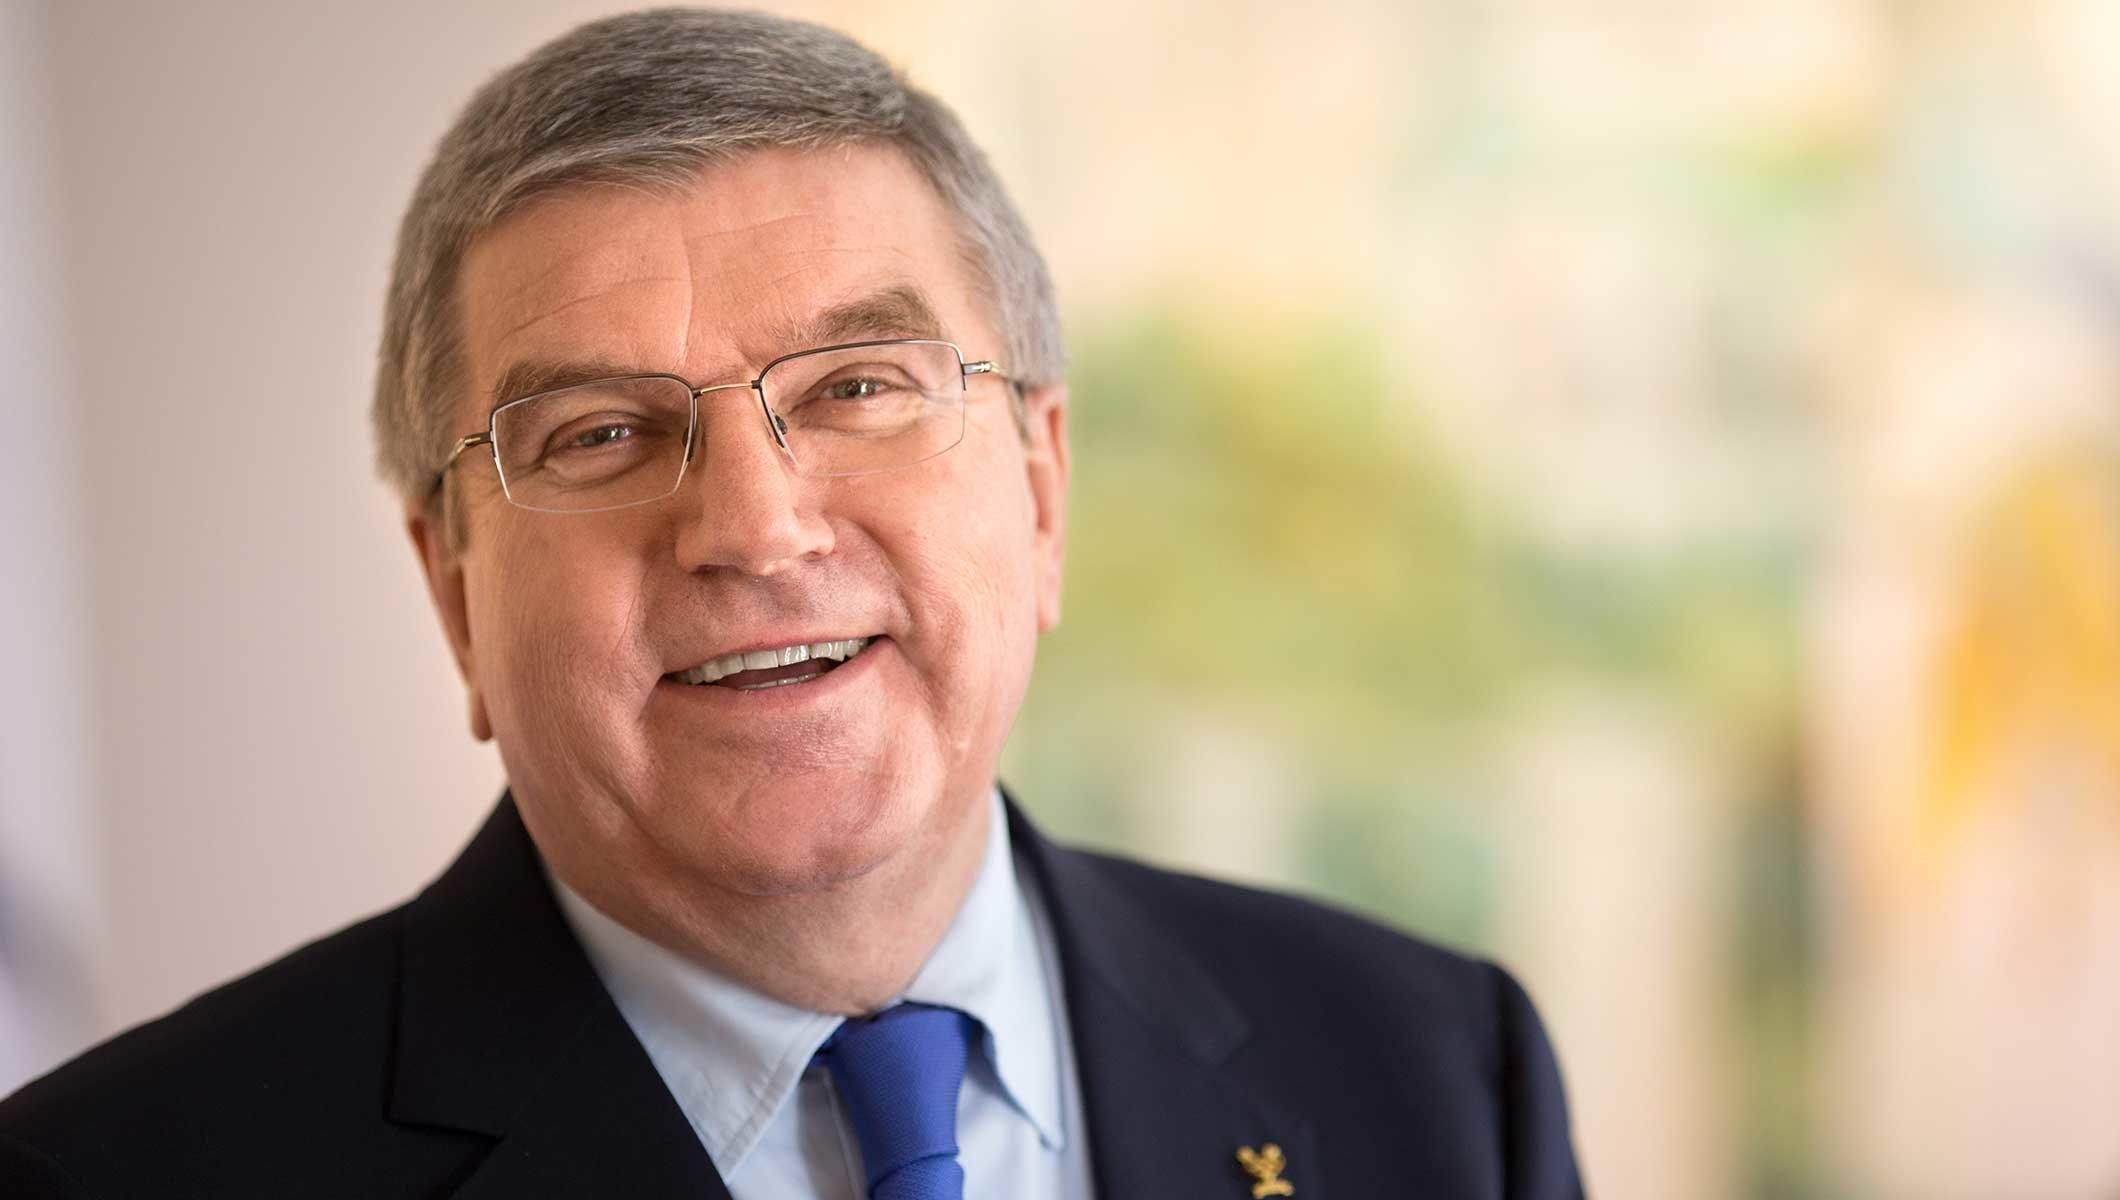 The photo of the IOC president that accompanied Thomas Bach's op-ed // IOC